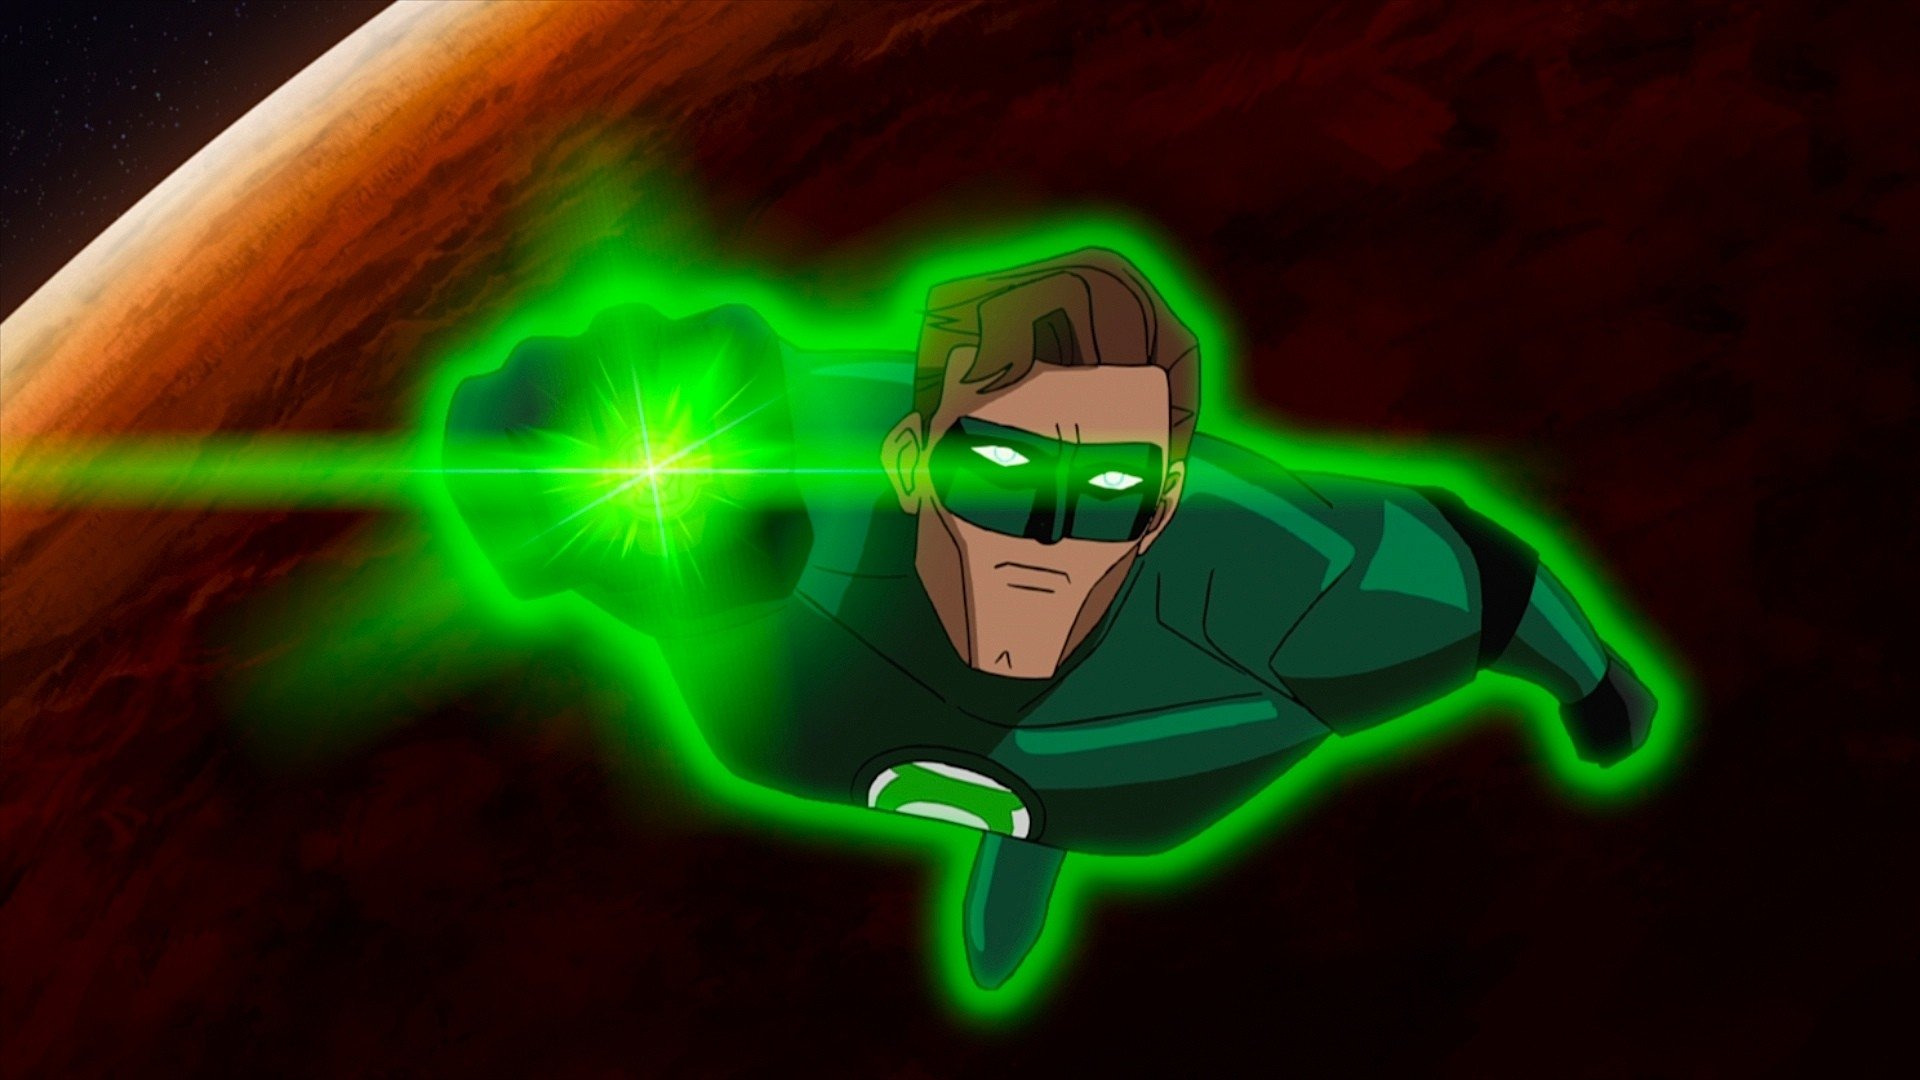 Green Lantern First Flight HD Wallpaper Background Image 1920x1080